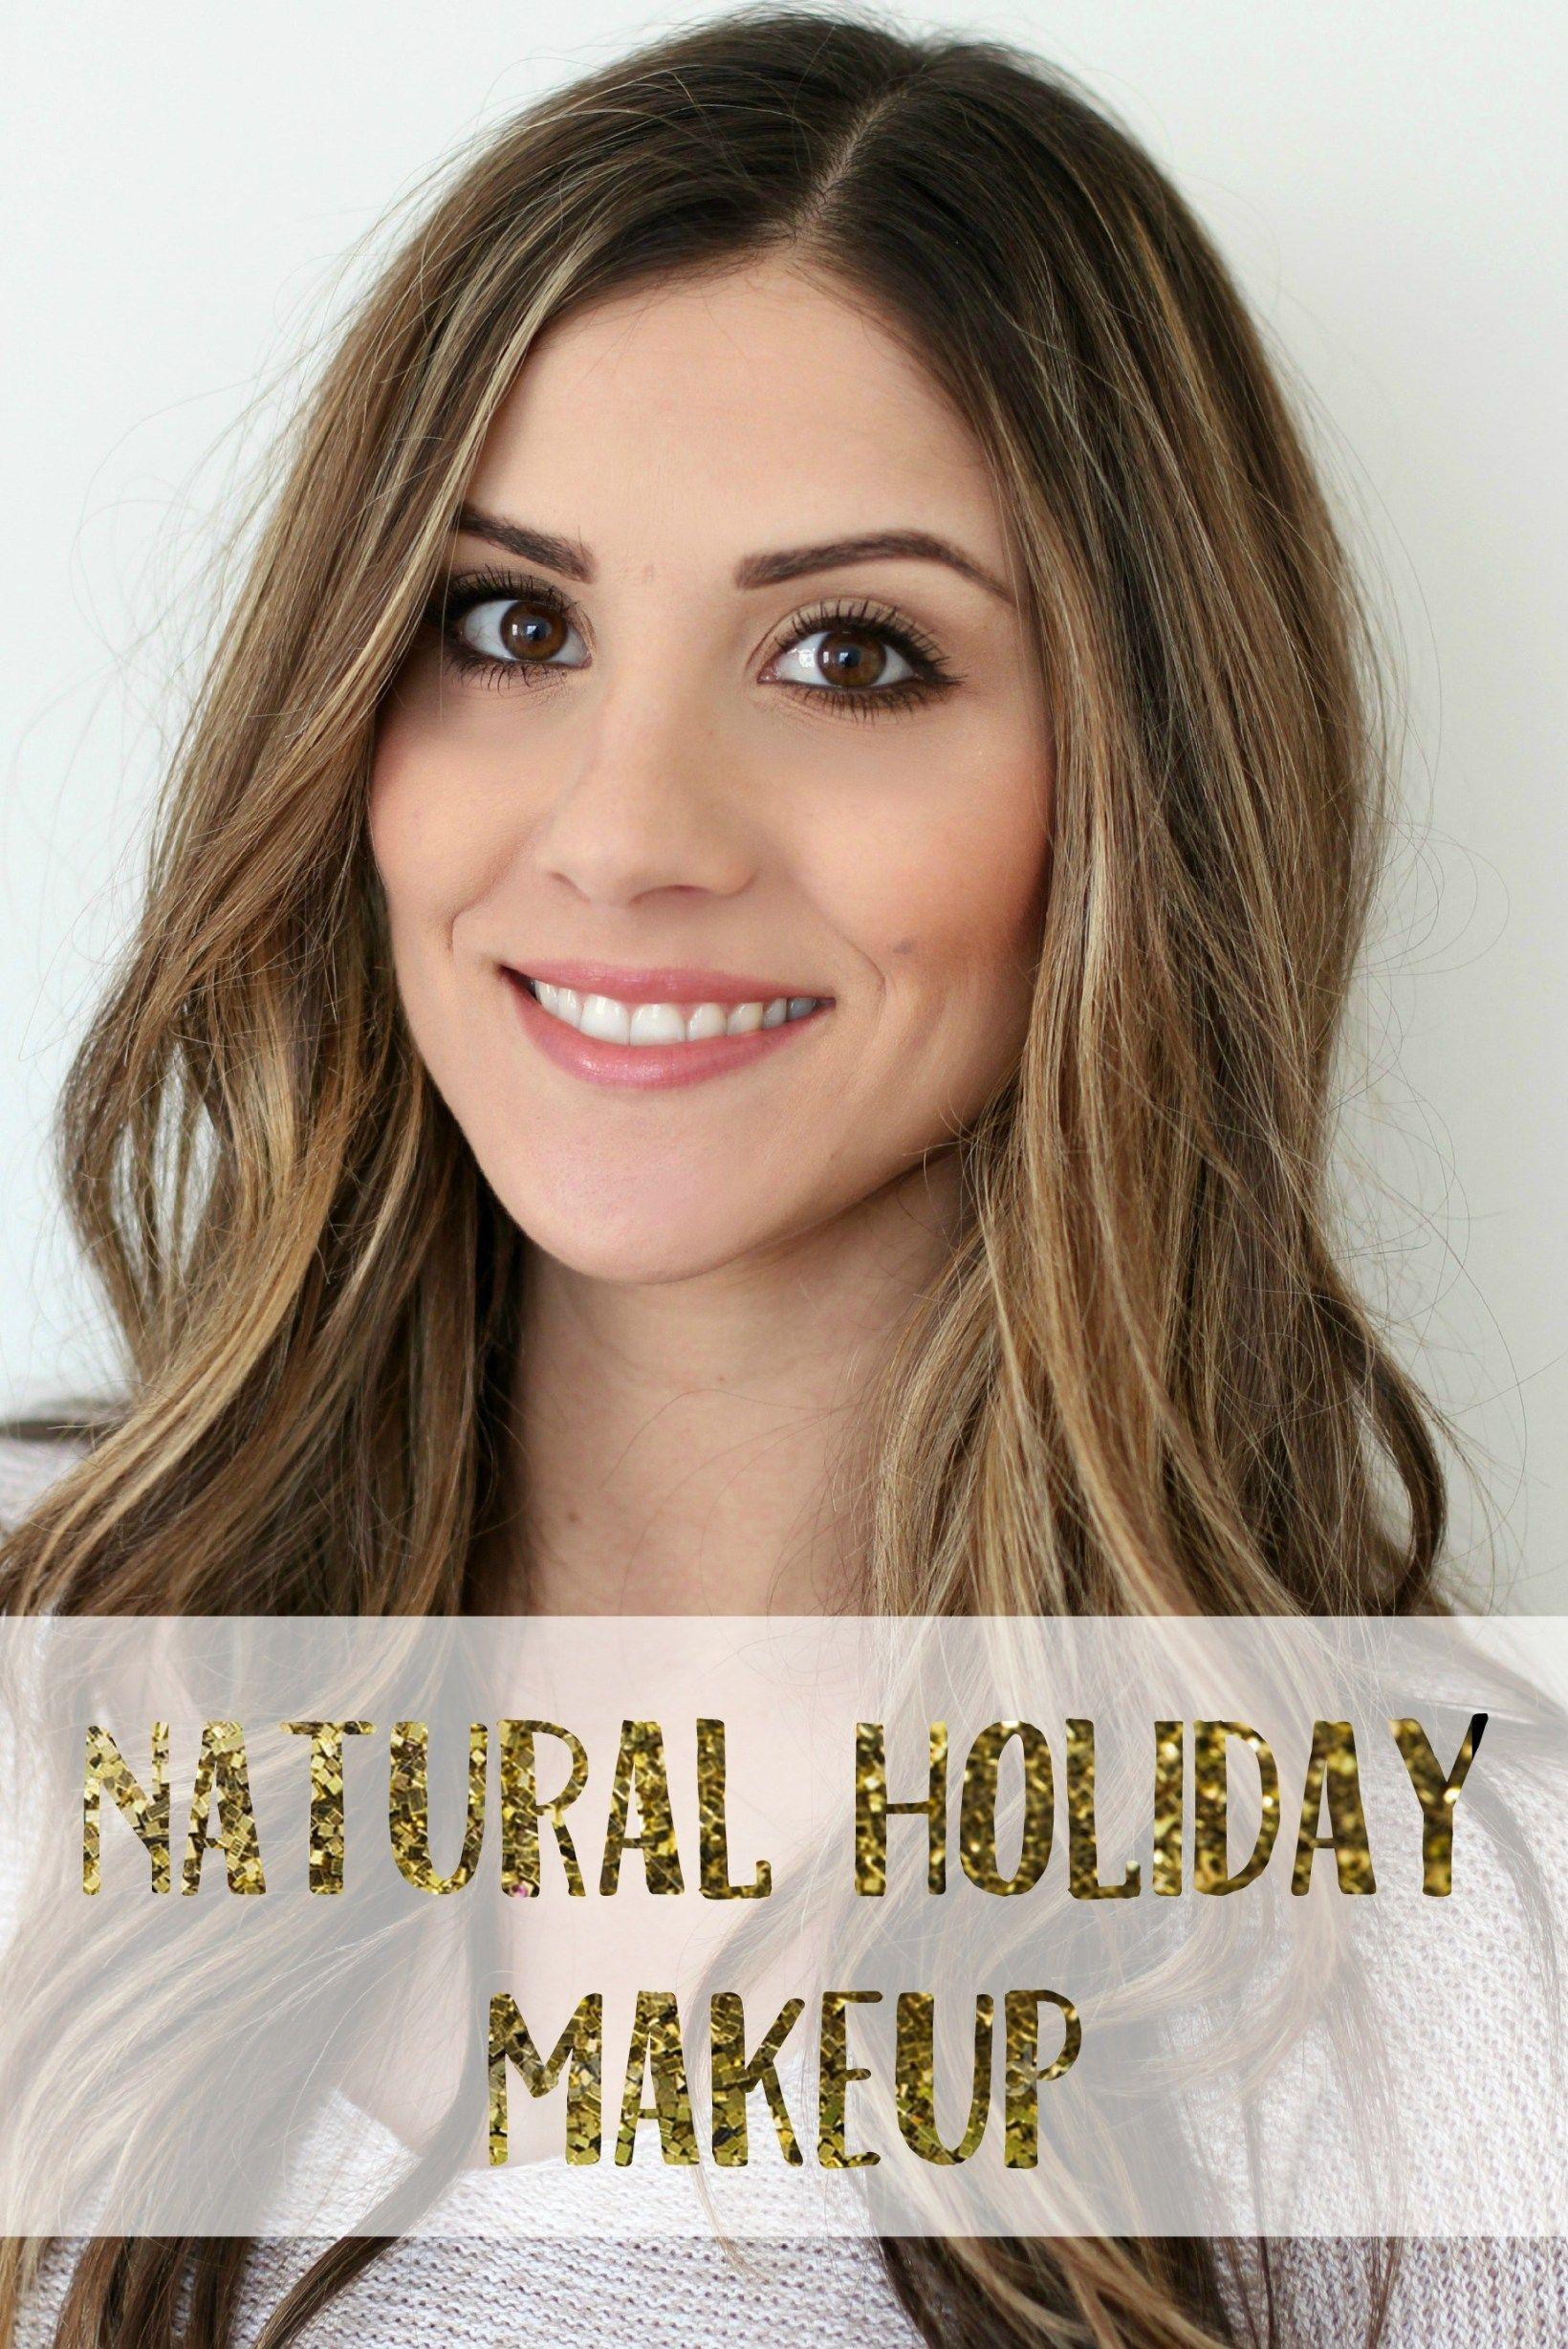 New Year's Eve Natural Holiday Makeup Holiday makeup